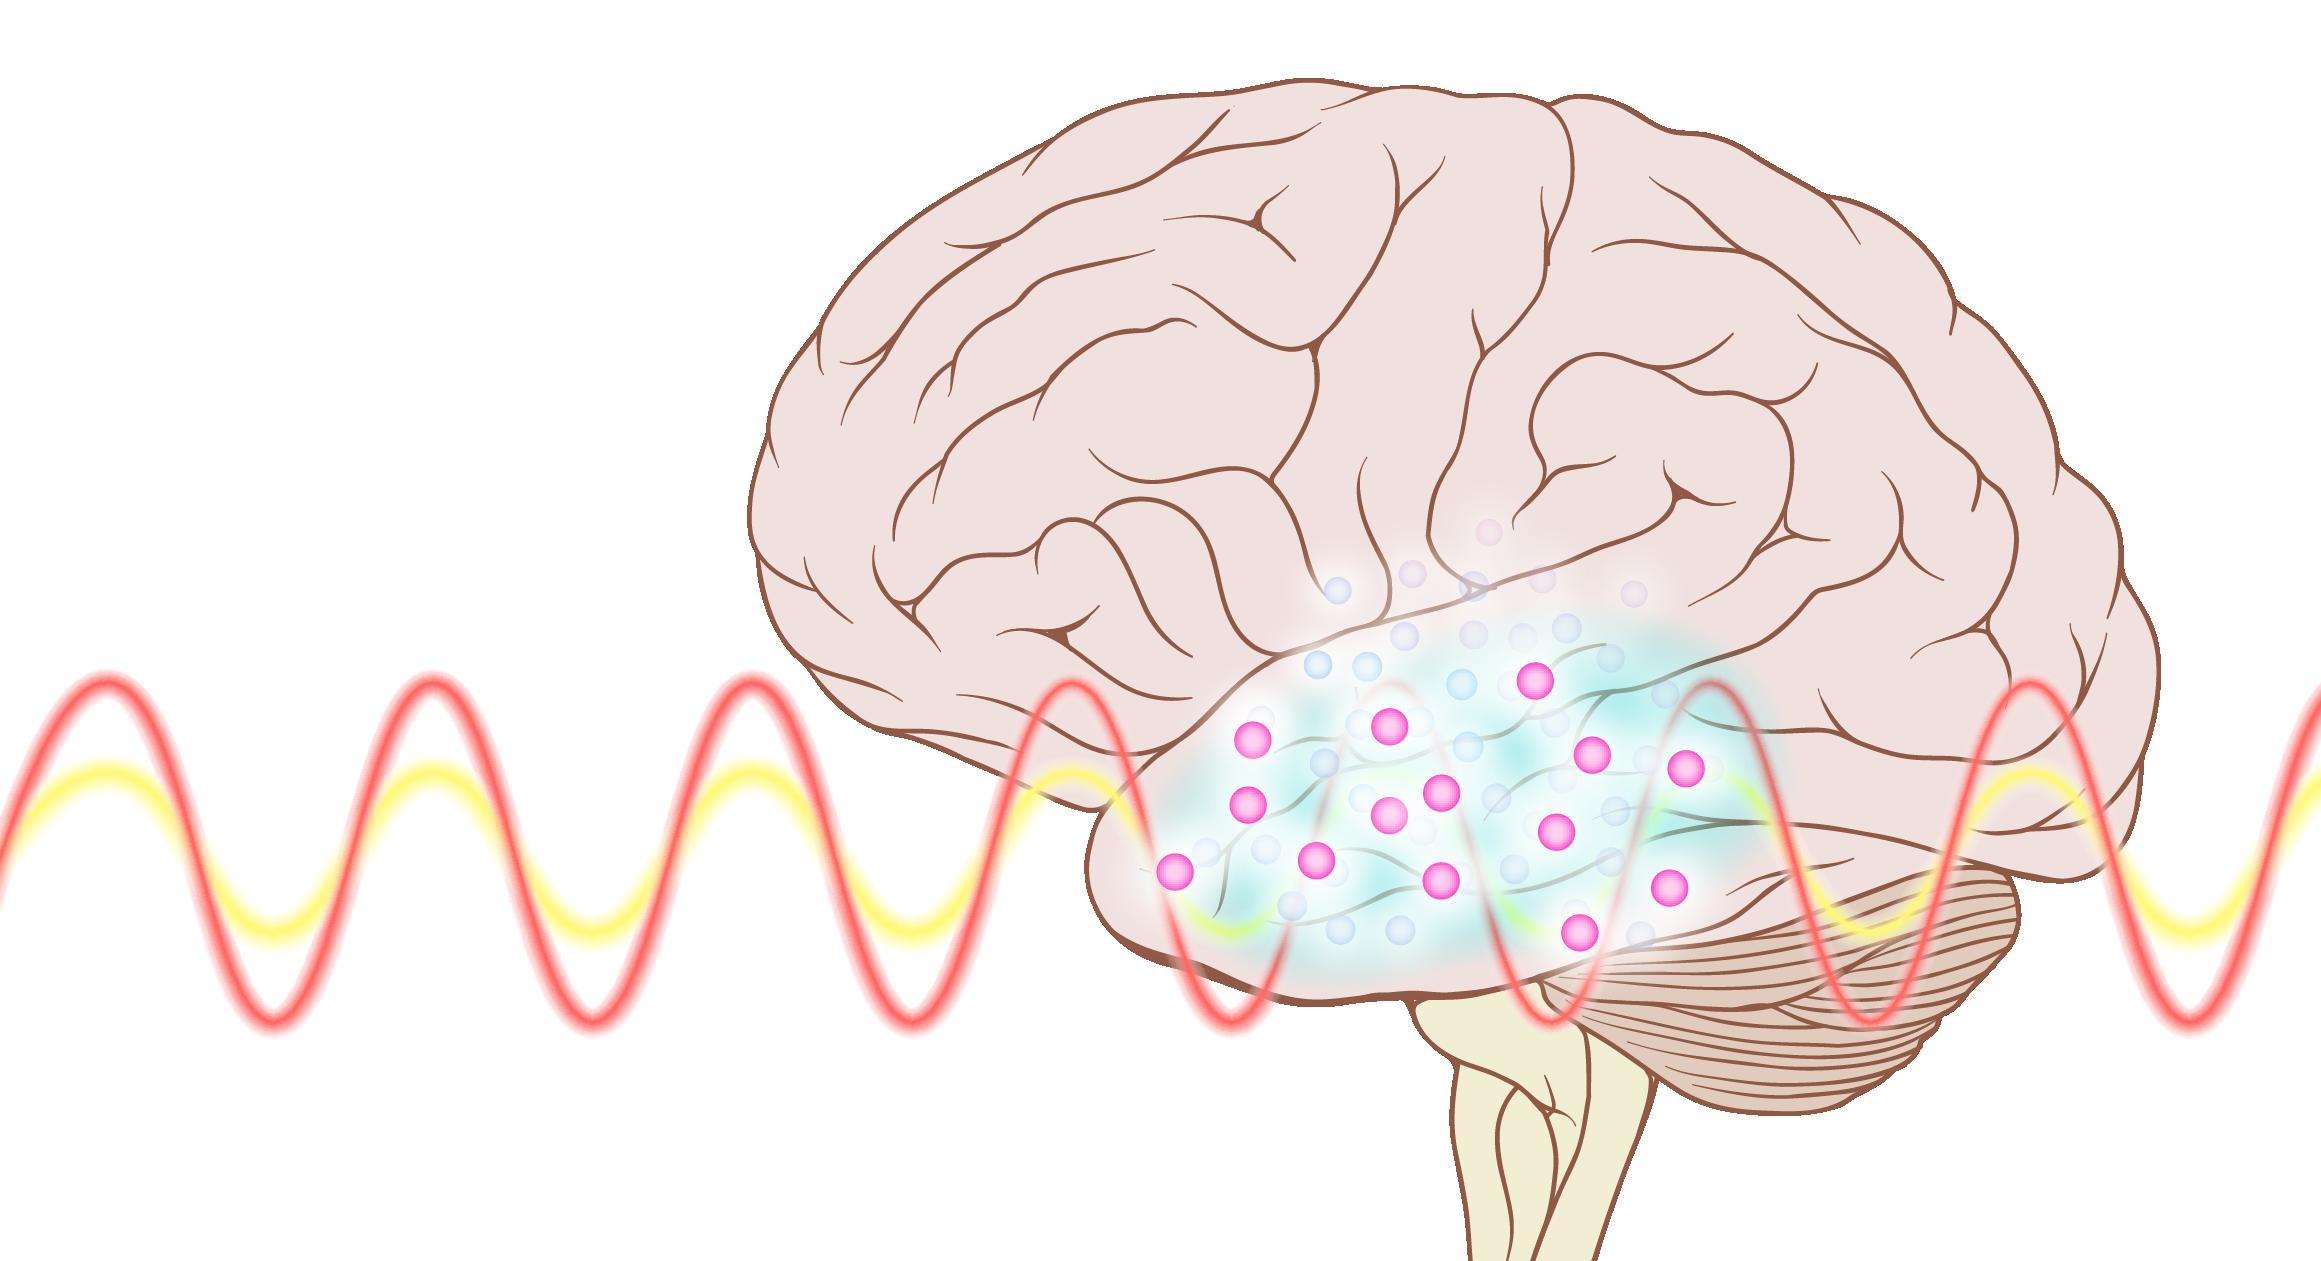 Non-Invasive Deep Brain Stimulation